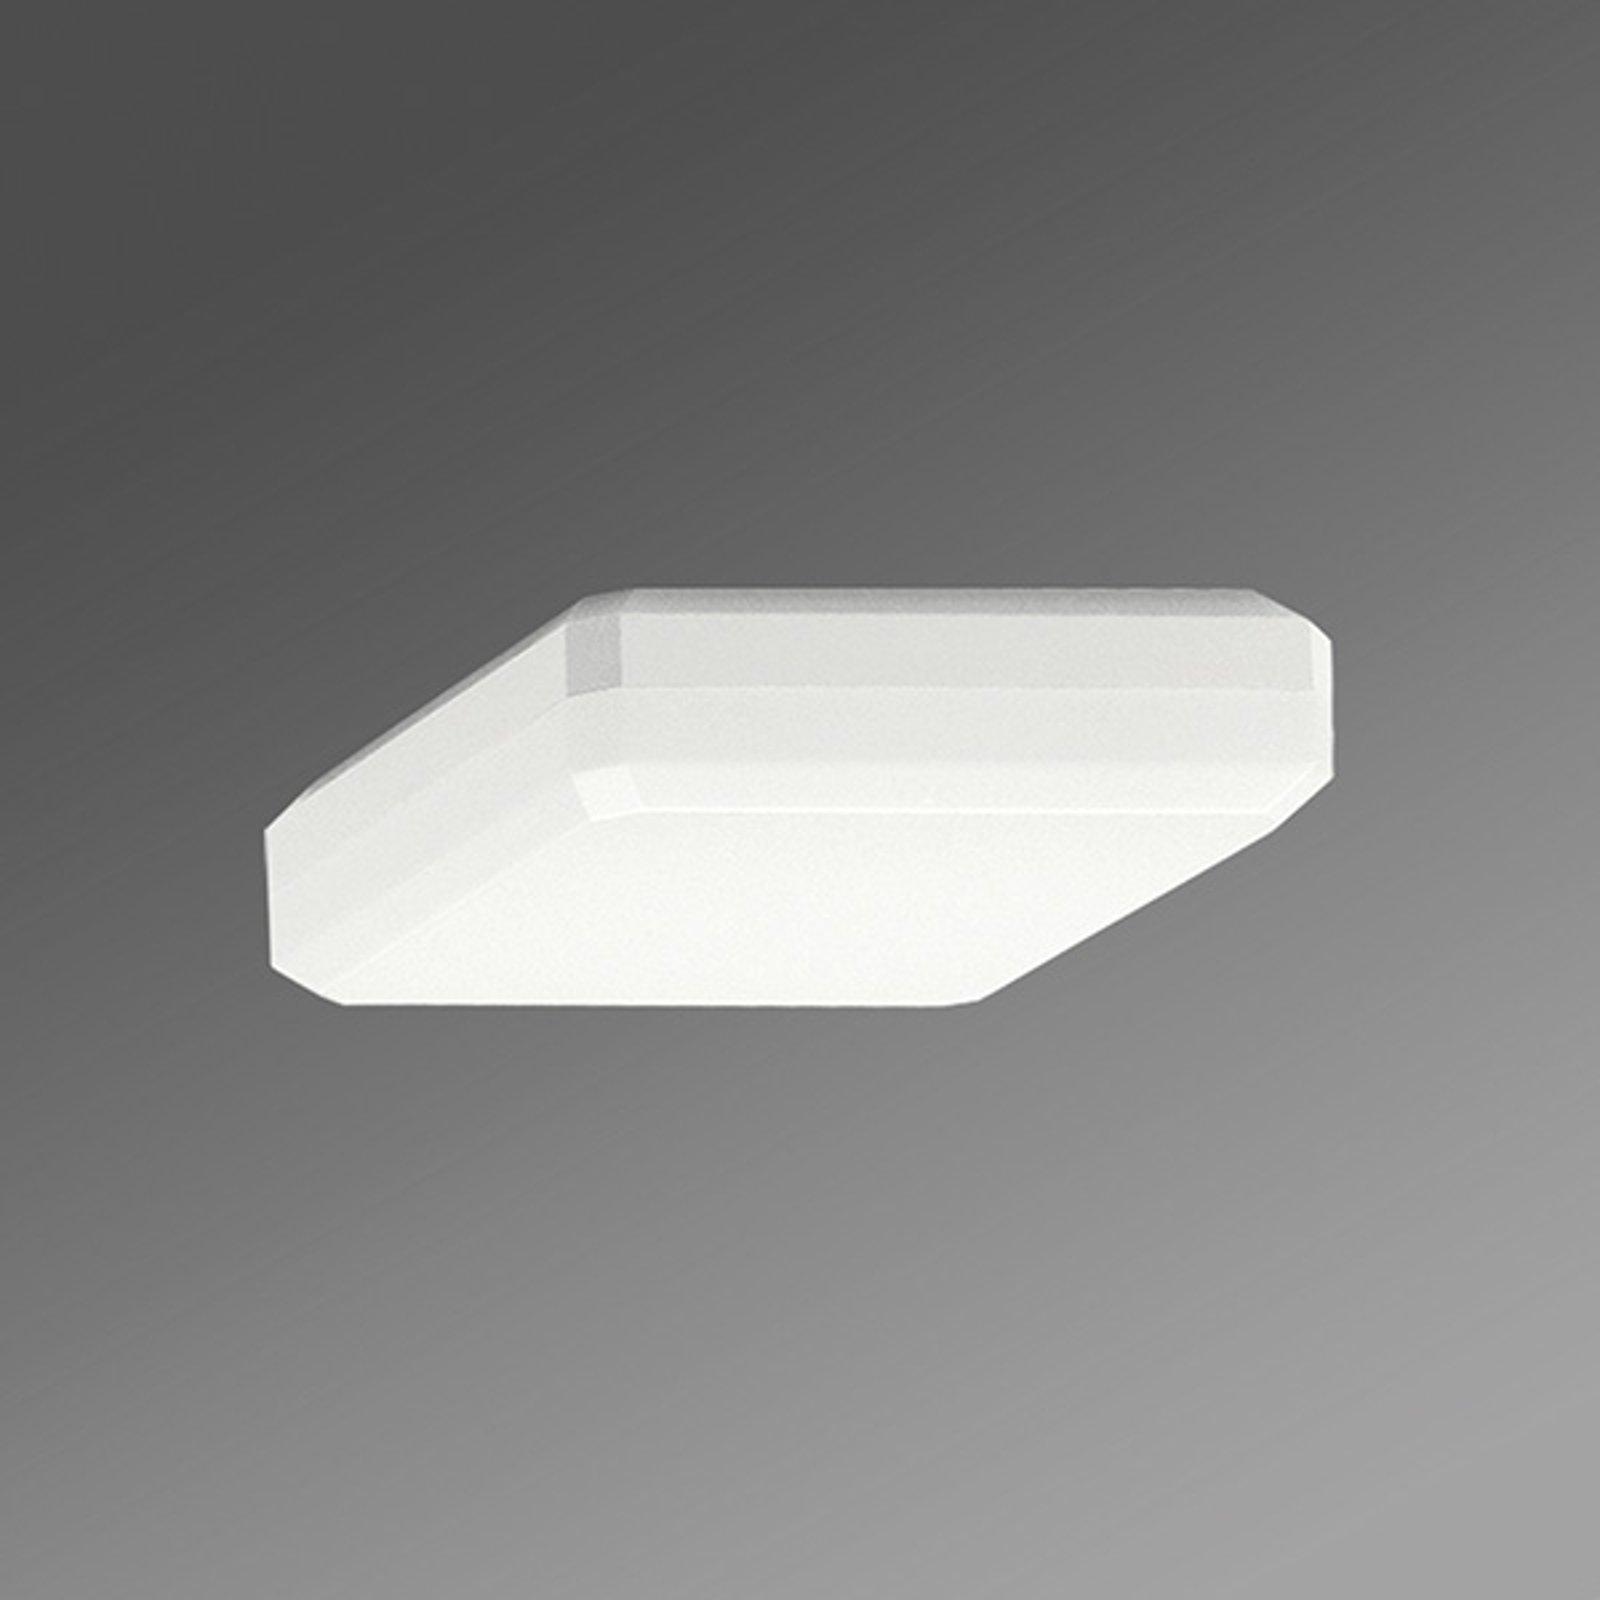 Takinnfellingslampe WQL spreder opal universalhvit